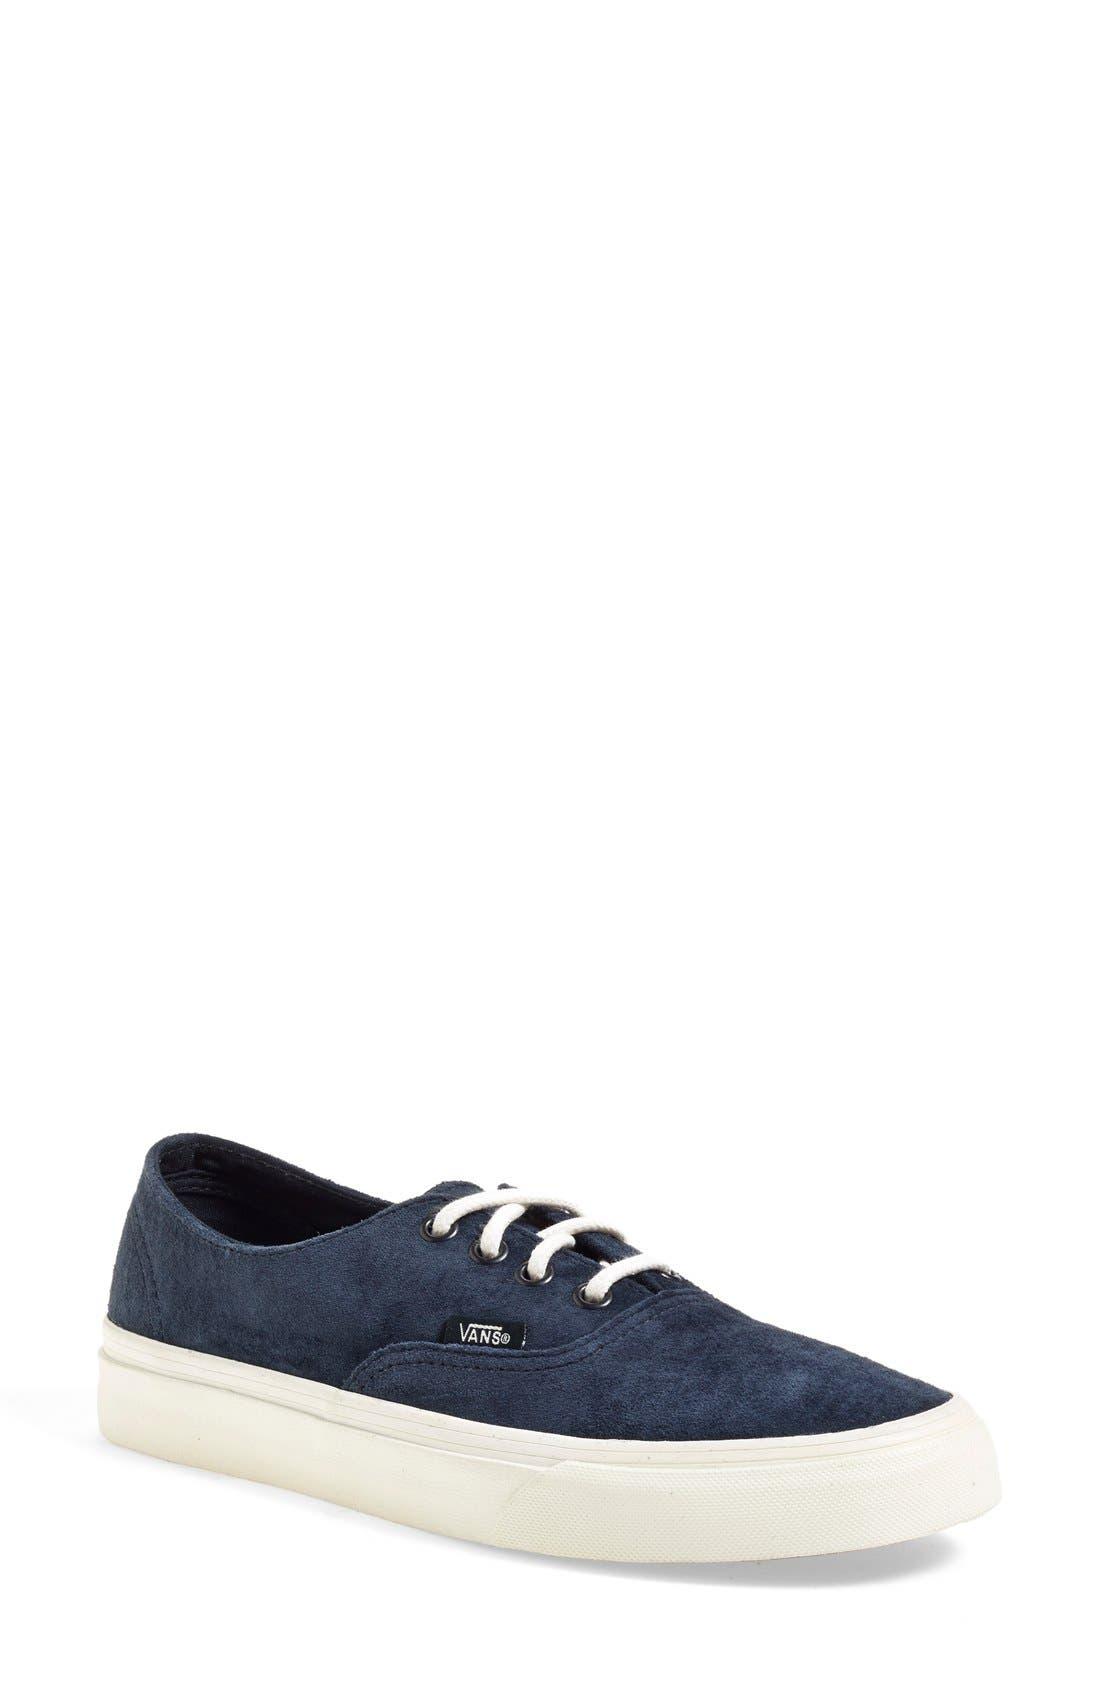 Alternate Image 1 Selected - Vans 'Authentic - Era Decon CA' Sneaker (Women)